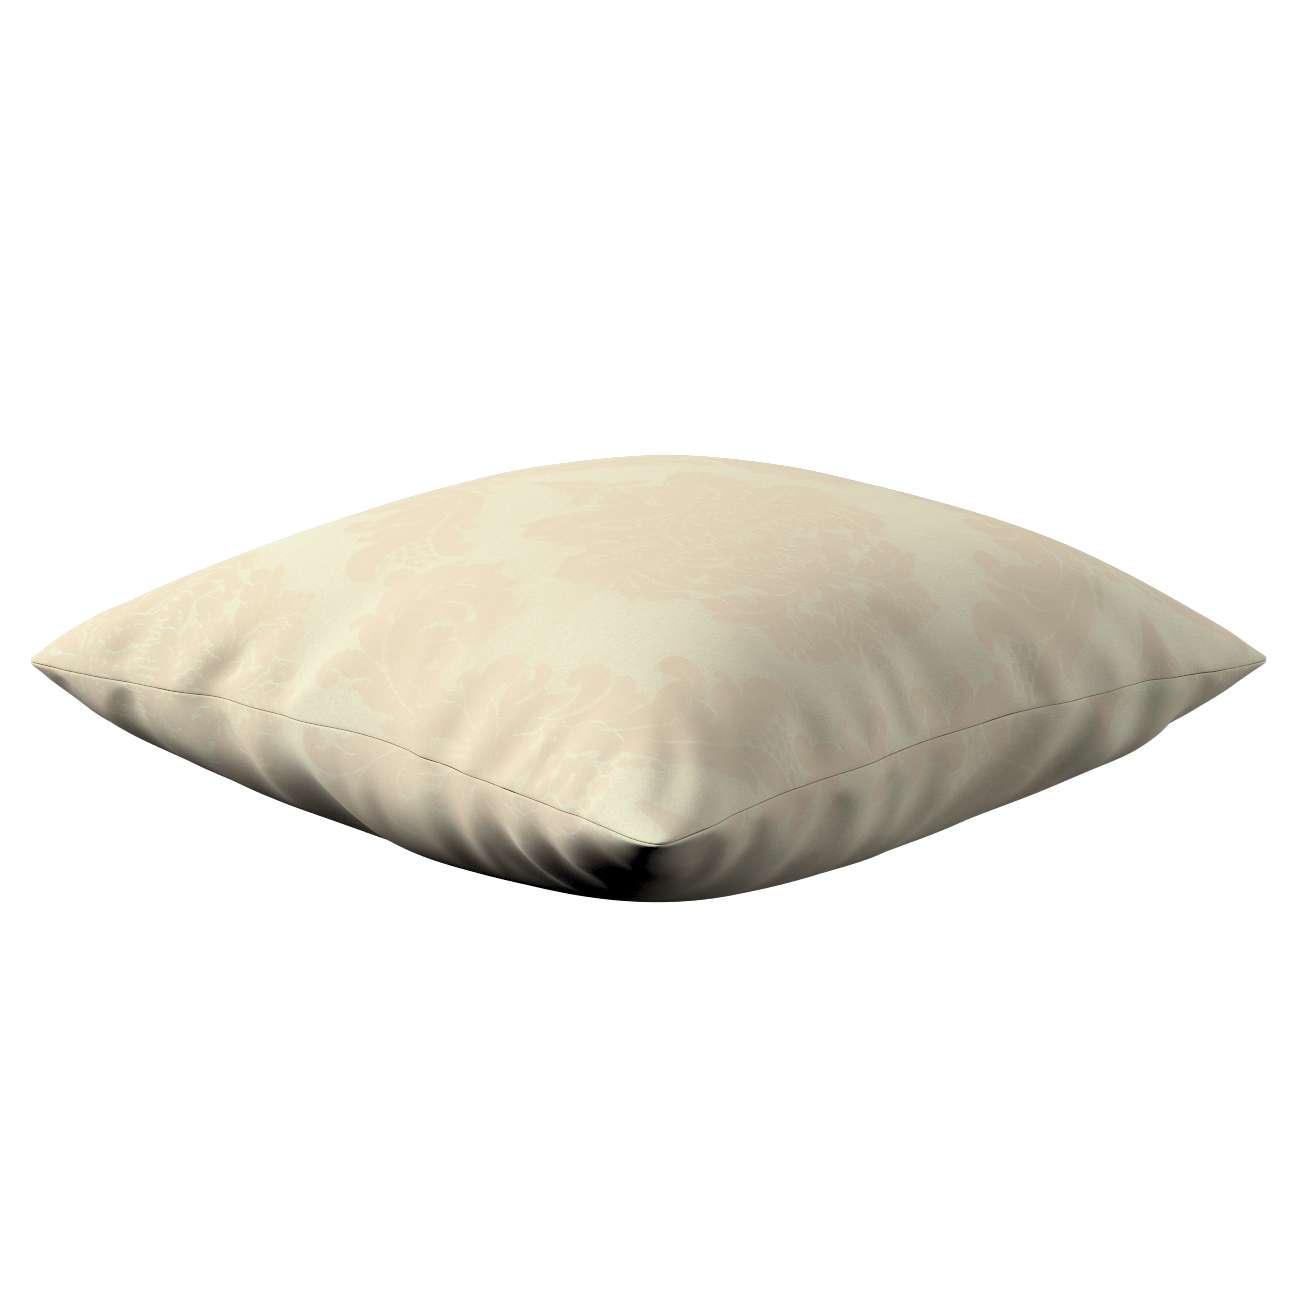 Kinga - potah na polštář jednoduchý v kolekci Damasco, látka: 613-01